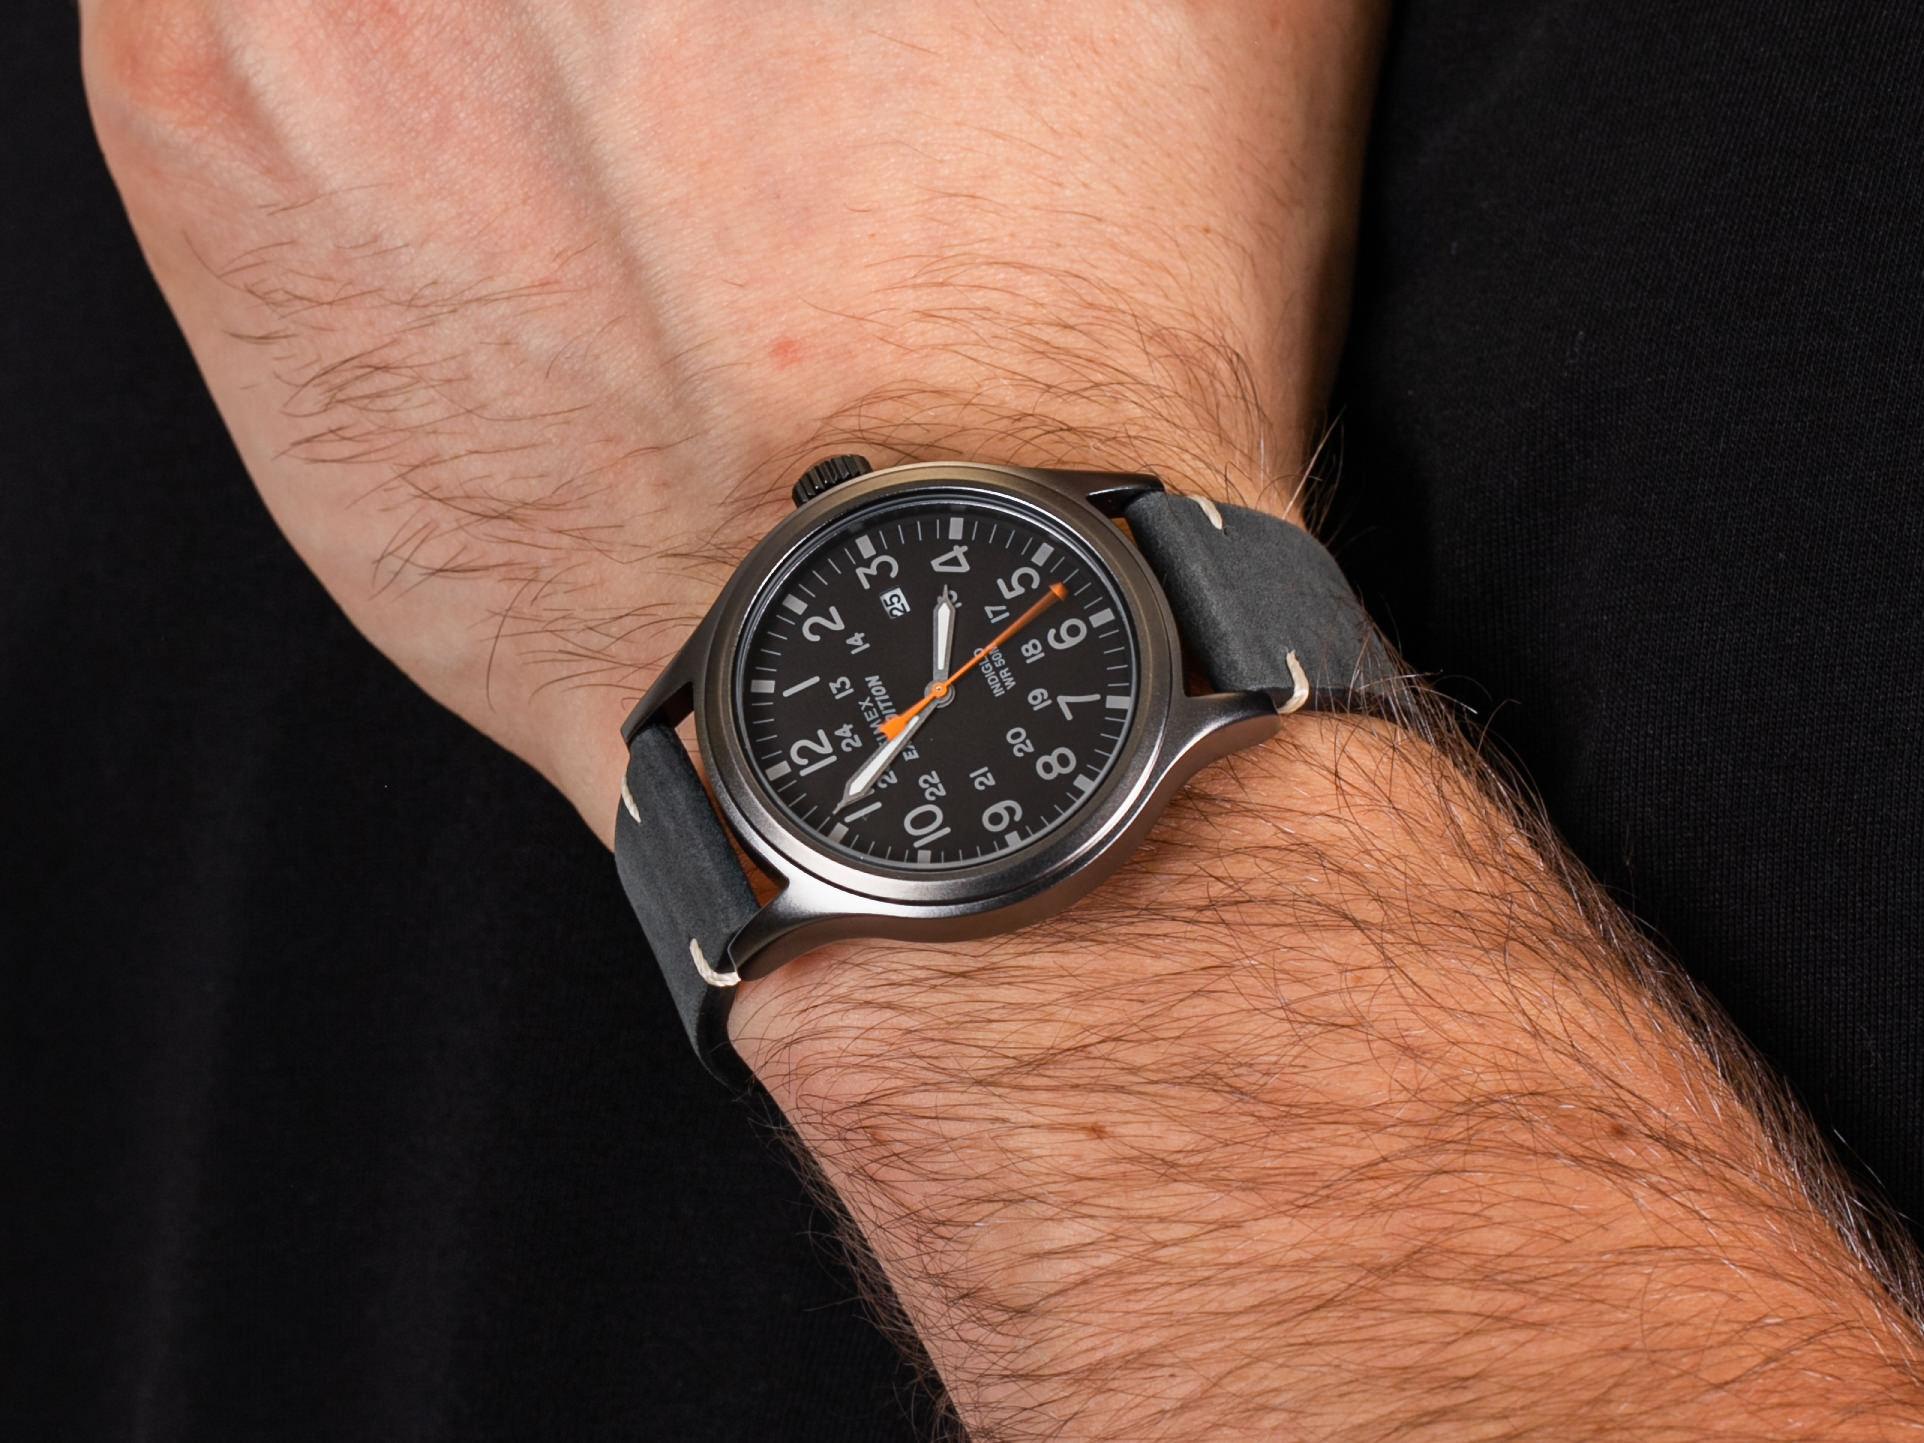 Timex TW4B01900 Expedition Scout zegarek klasyczny Expedition